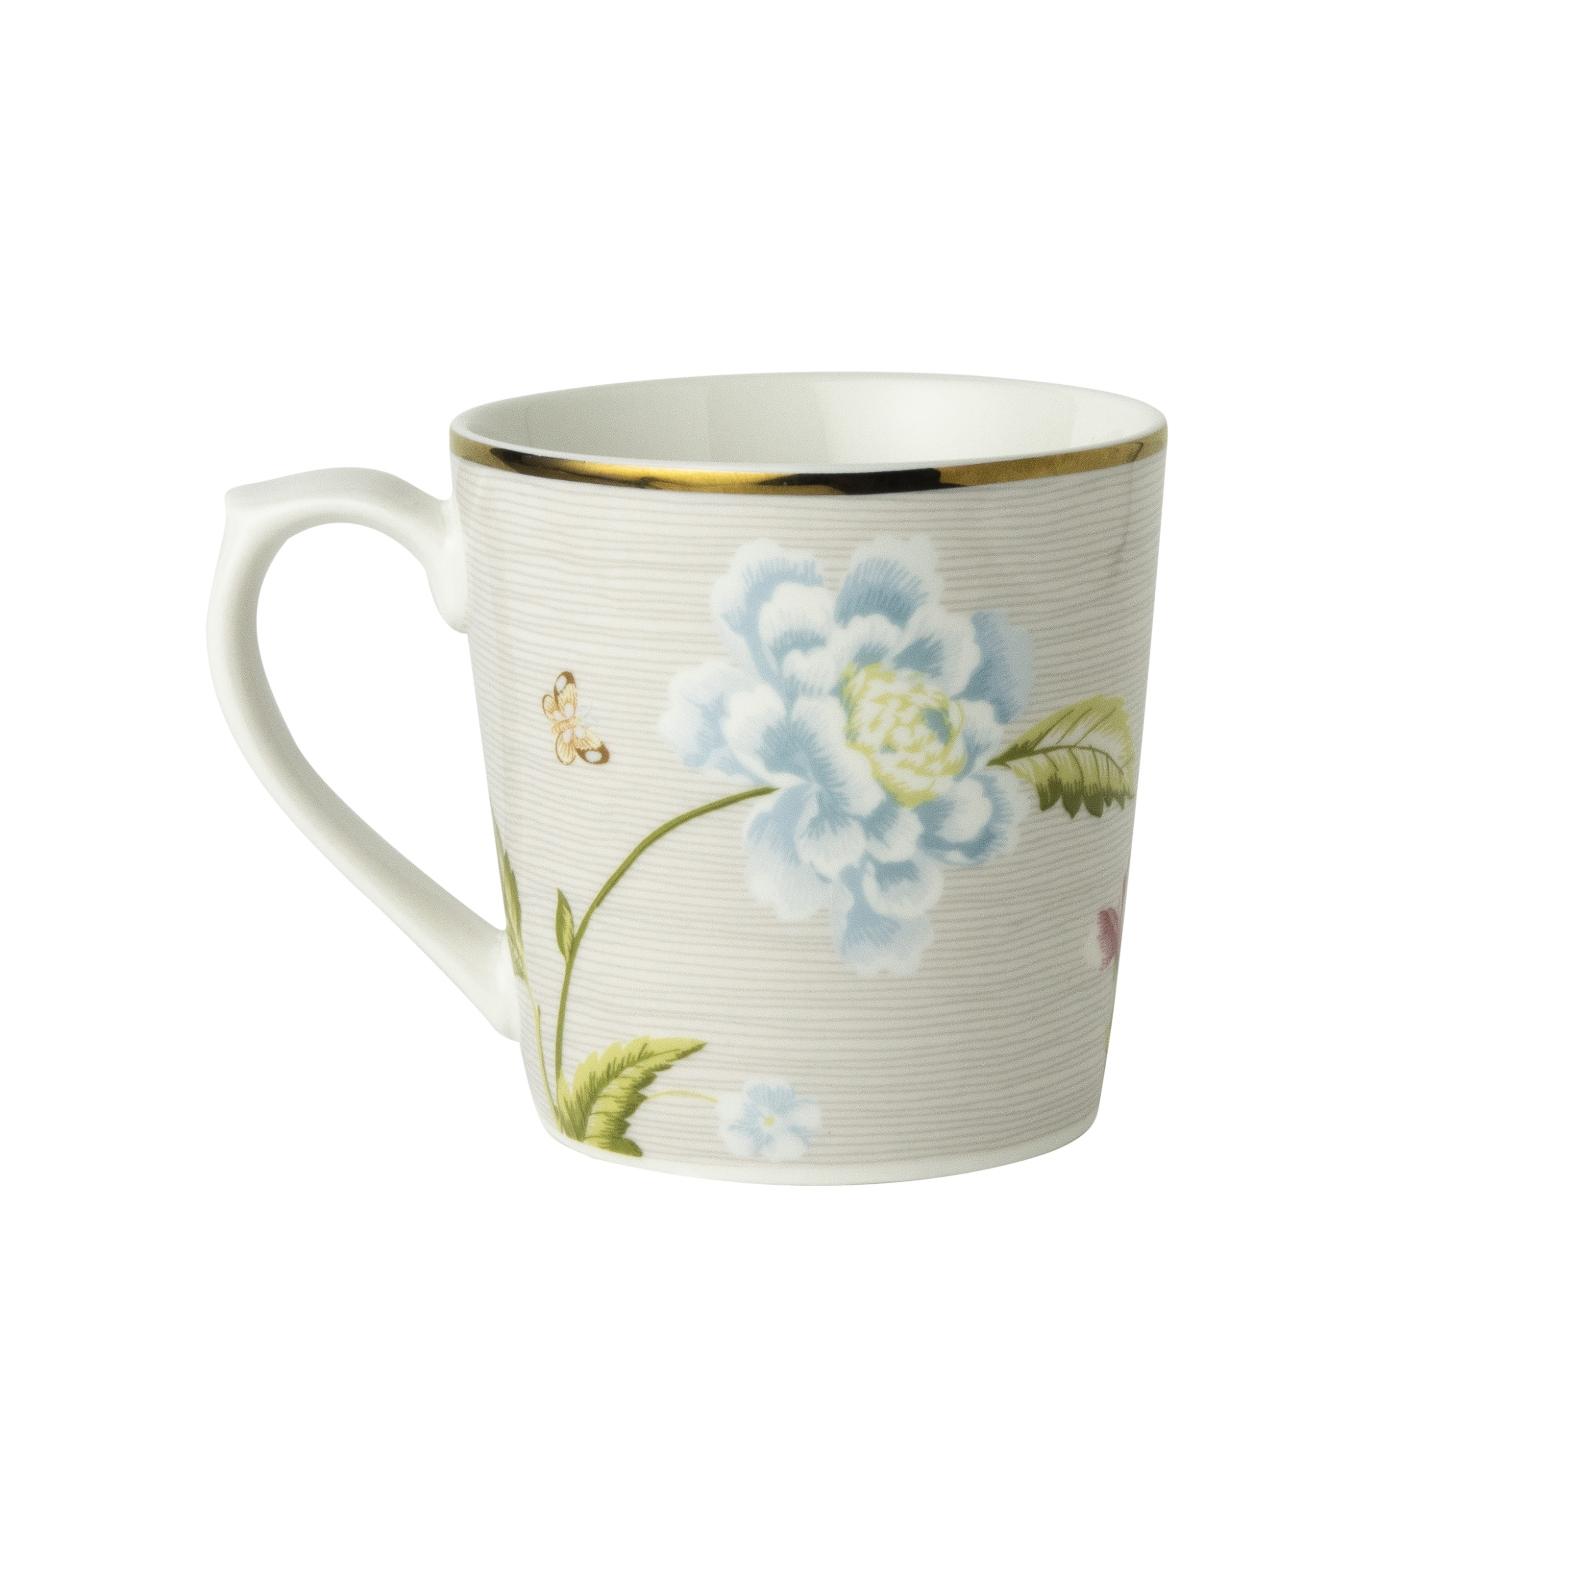 "Онлайн каталог PROMENU: Кружка ""Цветы"" Laura Ashley HERITAGE, объем 0,35 л, серый с цветами                                   180512"